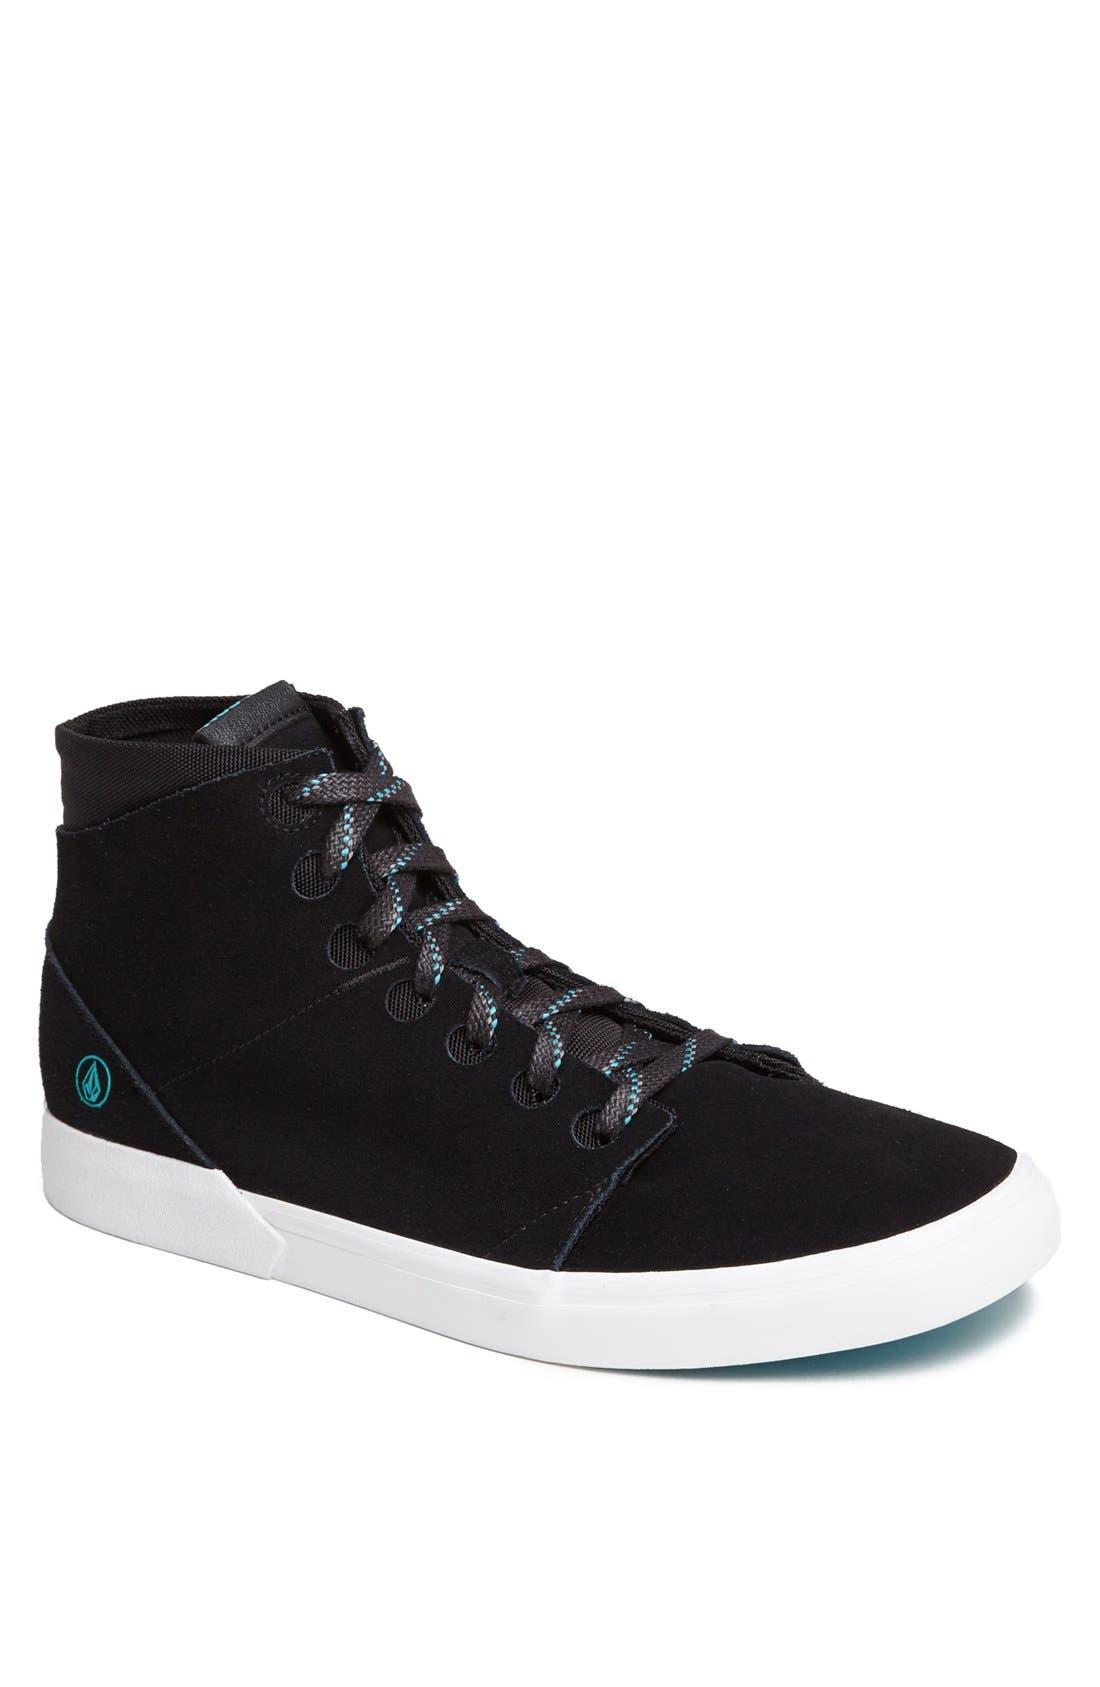 Main Image - Volcom 'Buzzard' Sneaker